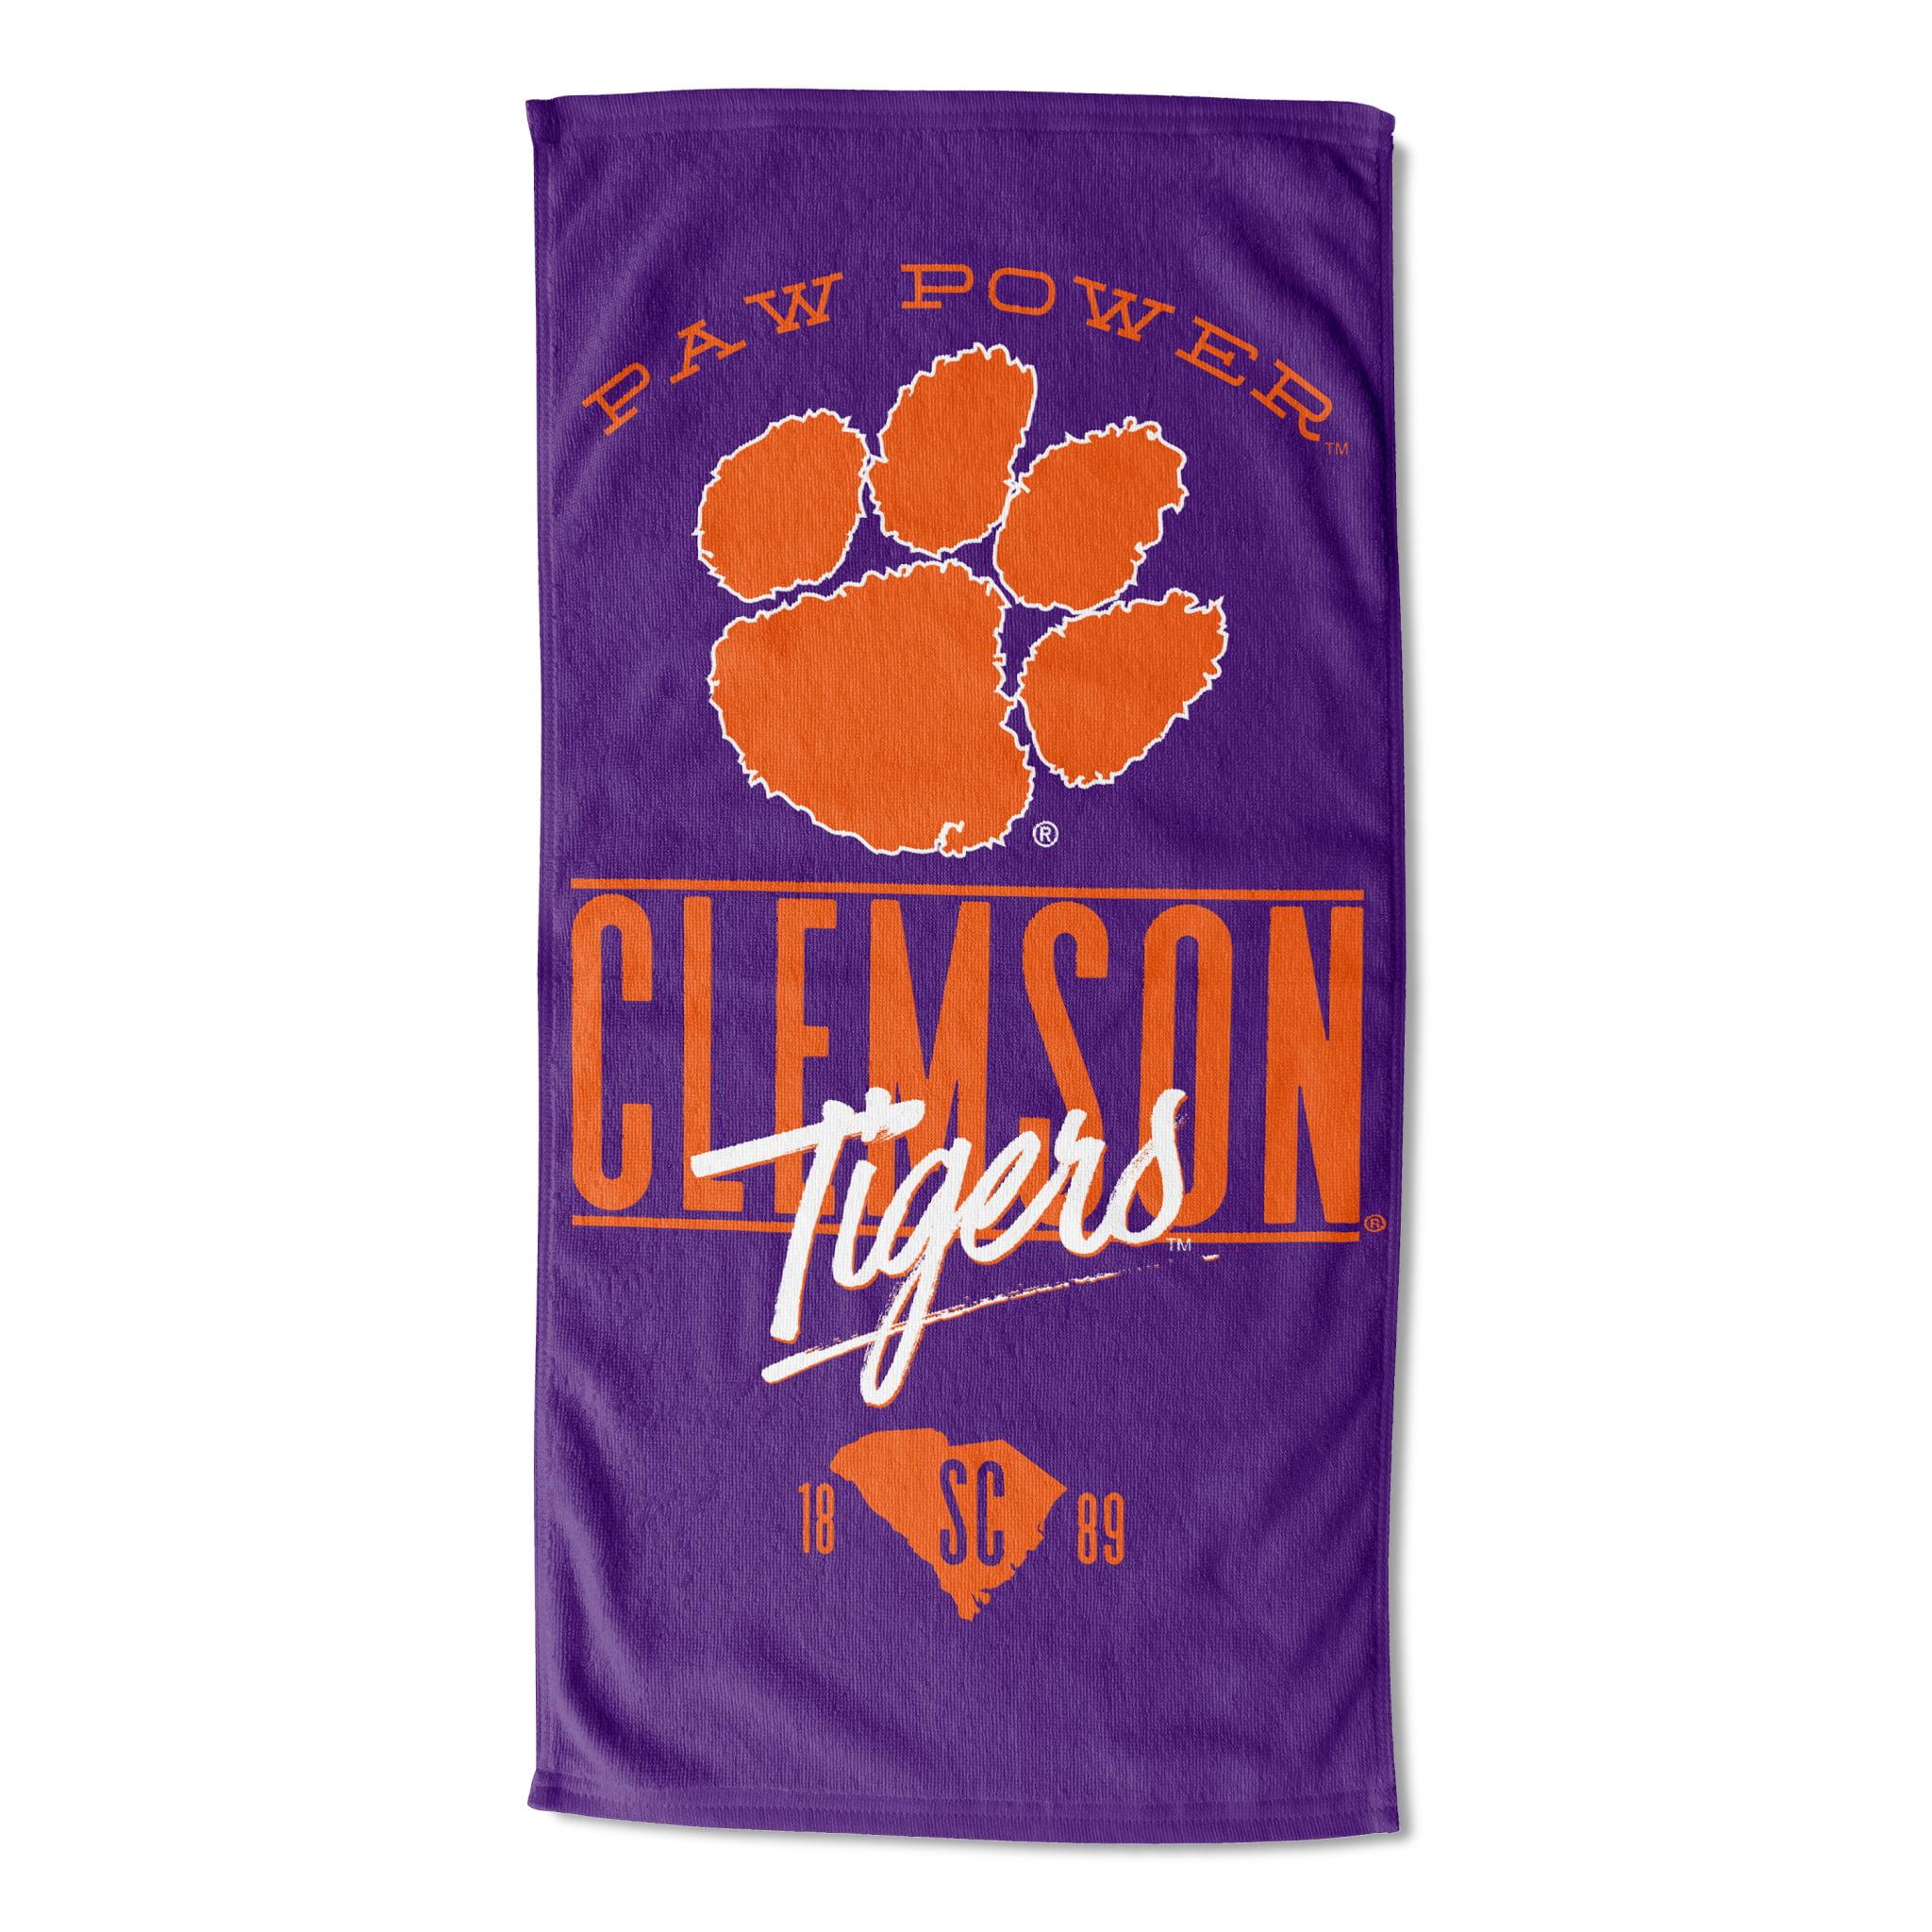 "NCAA Clemson Tigers 30"" x 60"" Beach Towel, 1 Each"